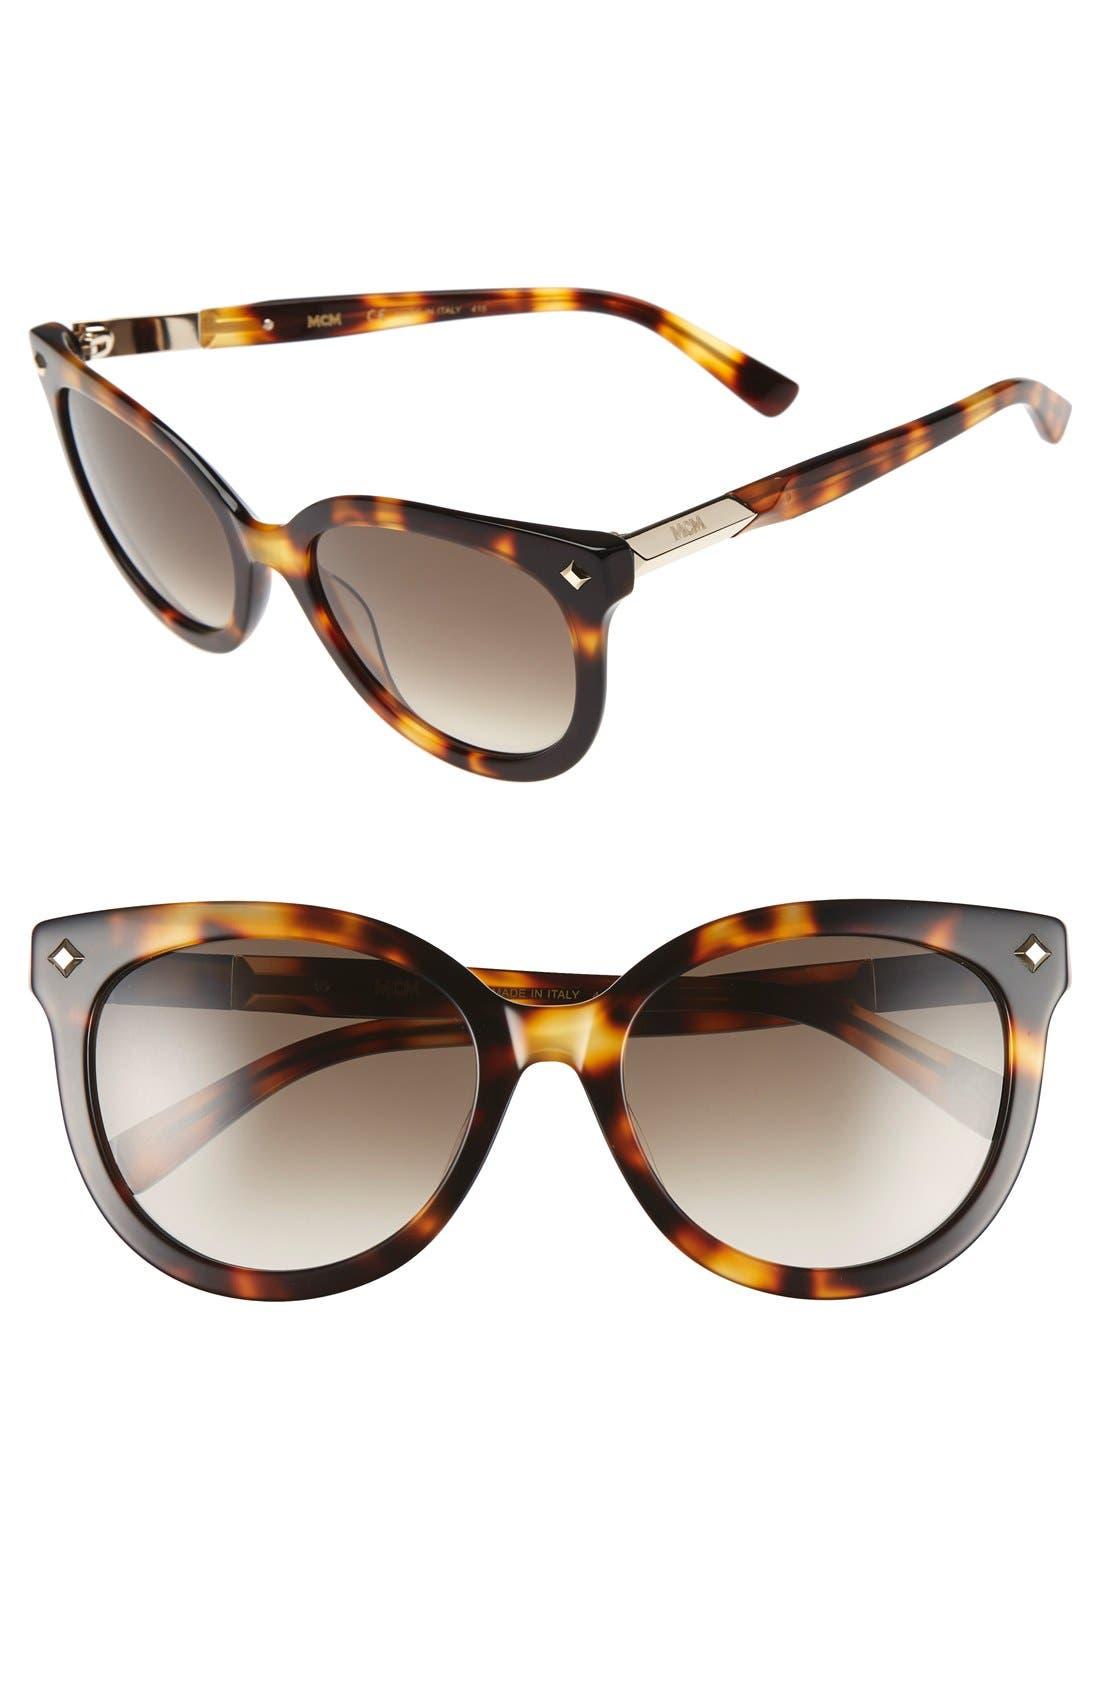 56mm Retro Sunglasses,                         Main,                         color, Havana